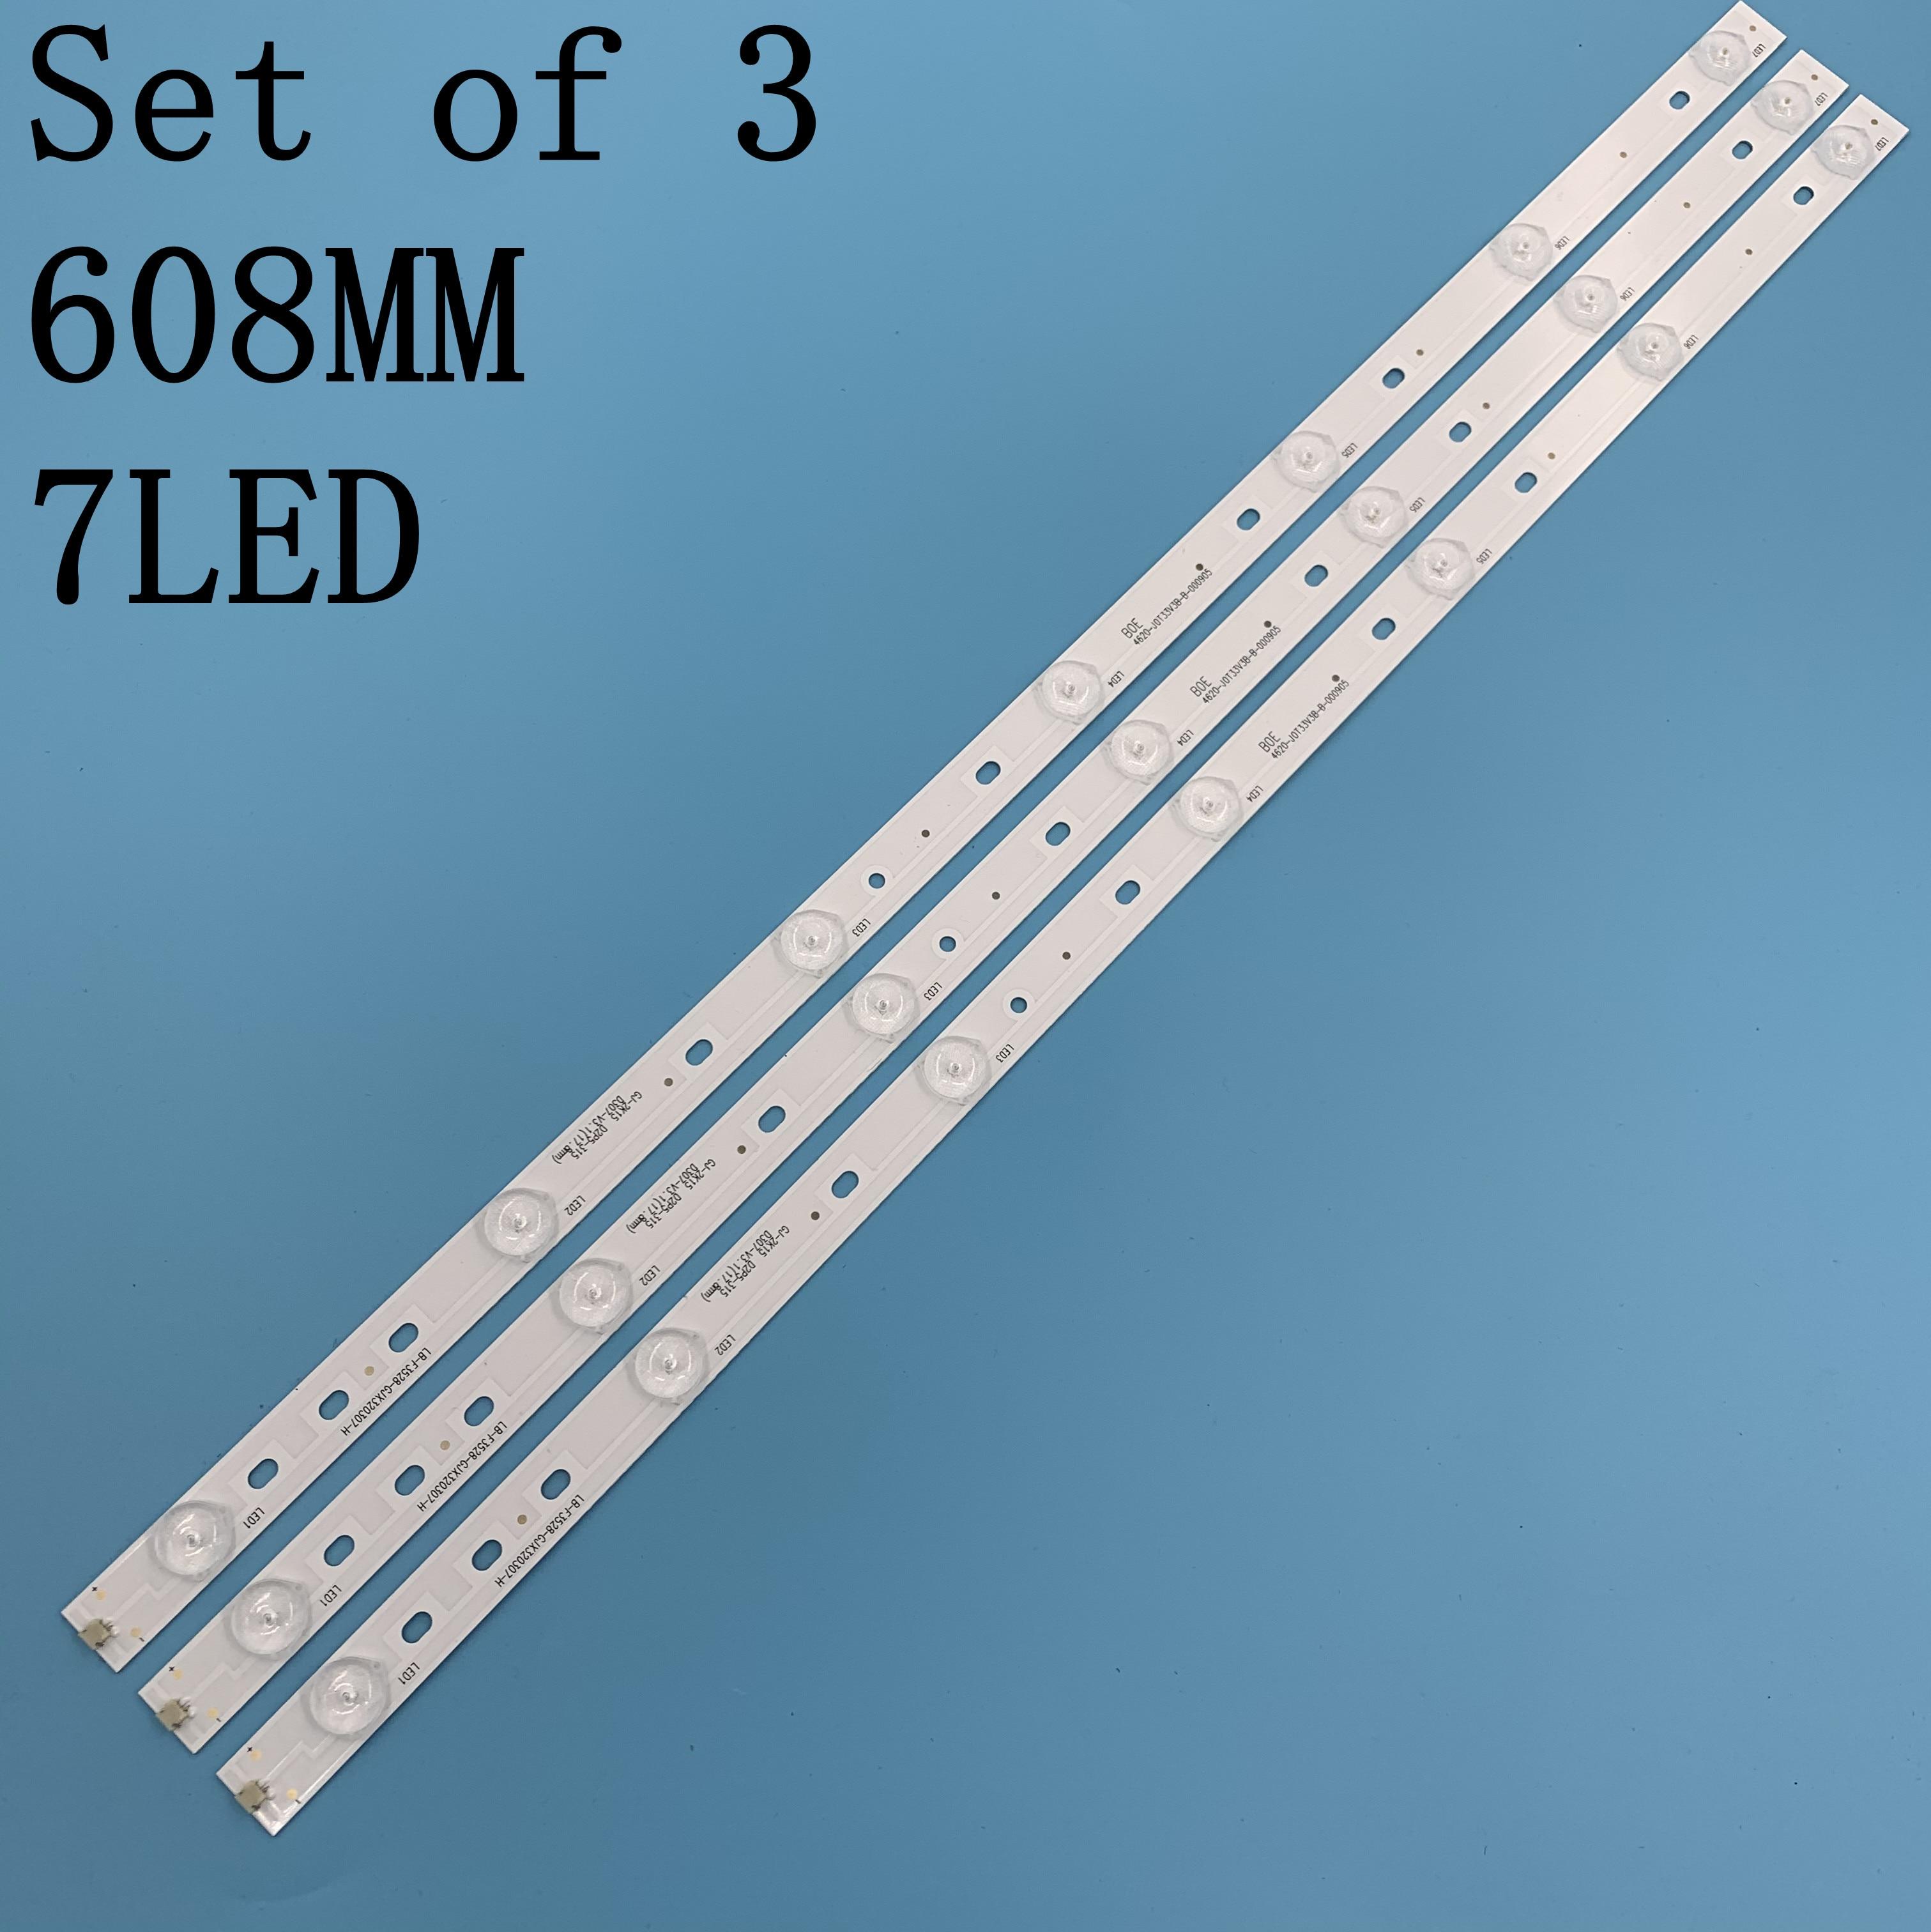 3pcs LED Backlight Lamp strip For LBM320P0701 FC 2 32PFK4309 32PHS5301 TPT315B5 32PFK4309 LB F3528 GJX320307 H T3250M 315LM00002|Industrial Computer & Accessories|   - AliExpress